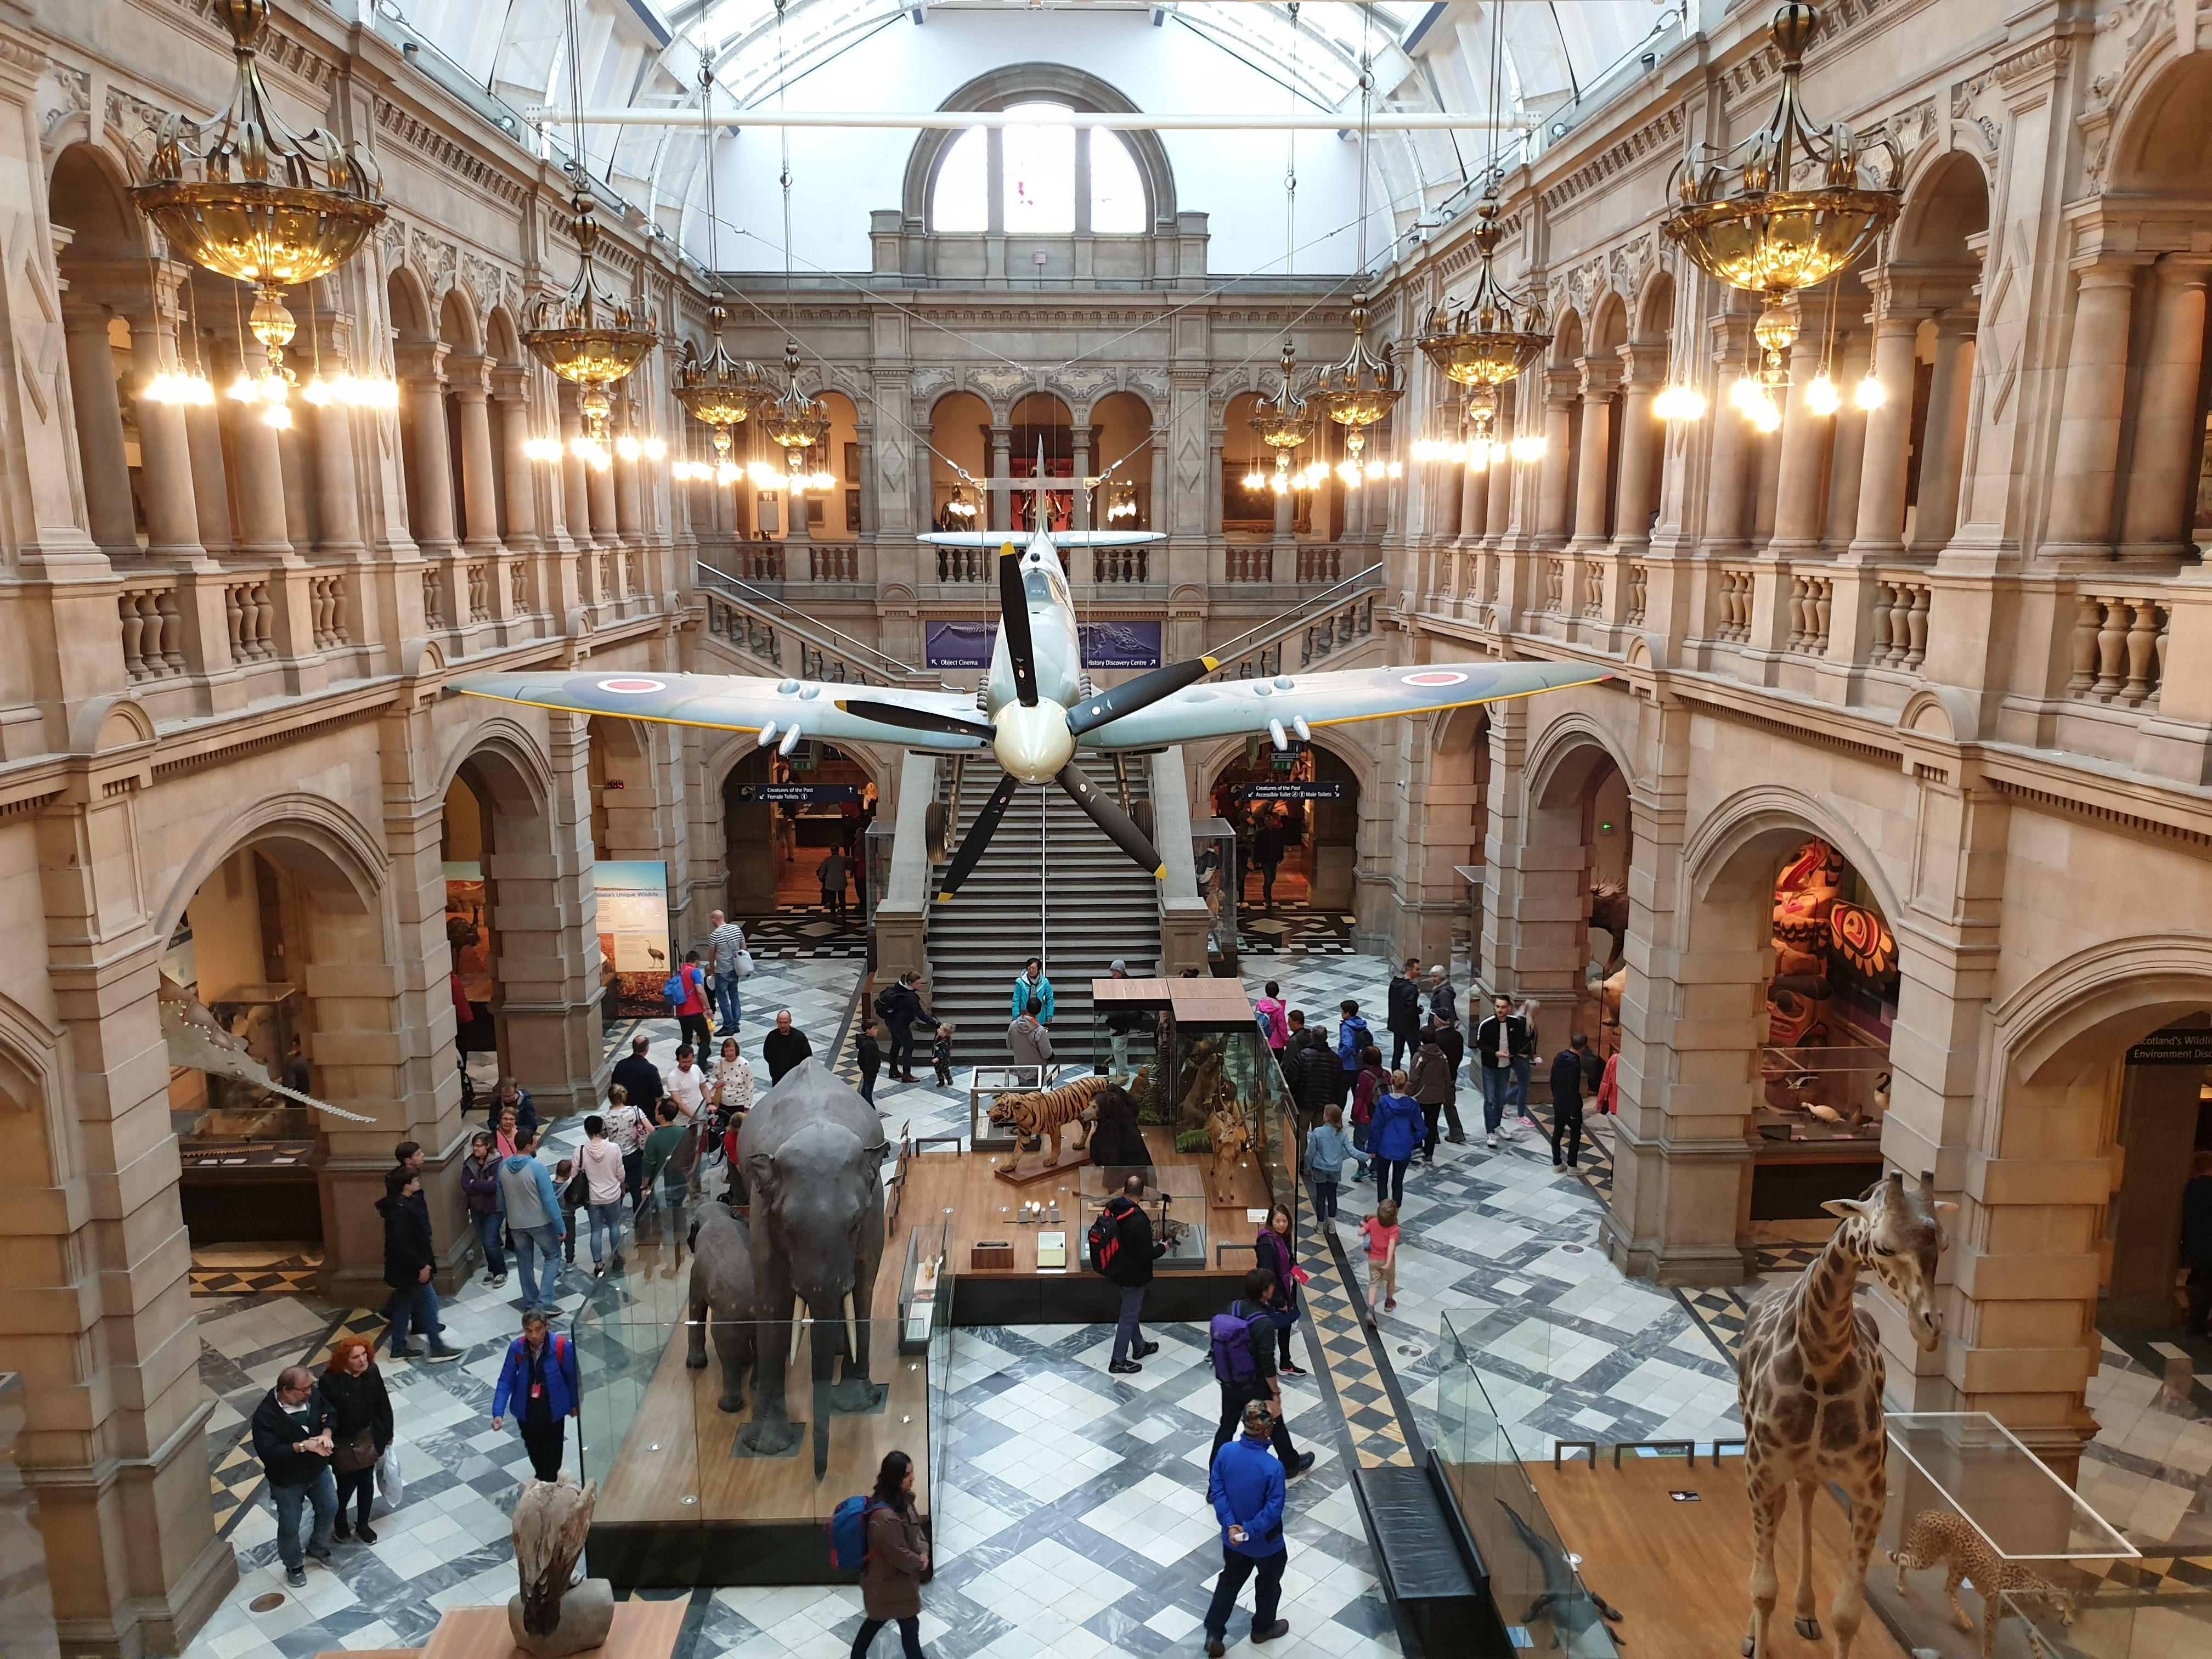 20190518 Glasgow Kelvingrove museum _144055